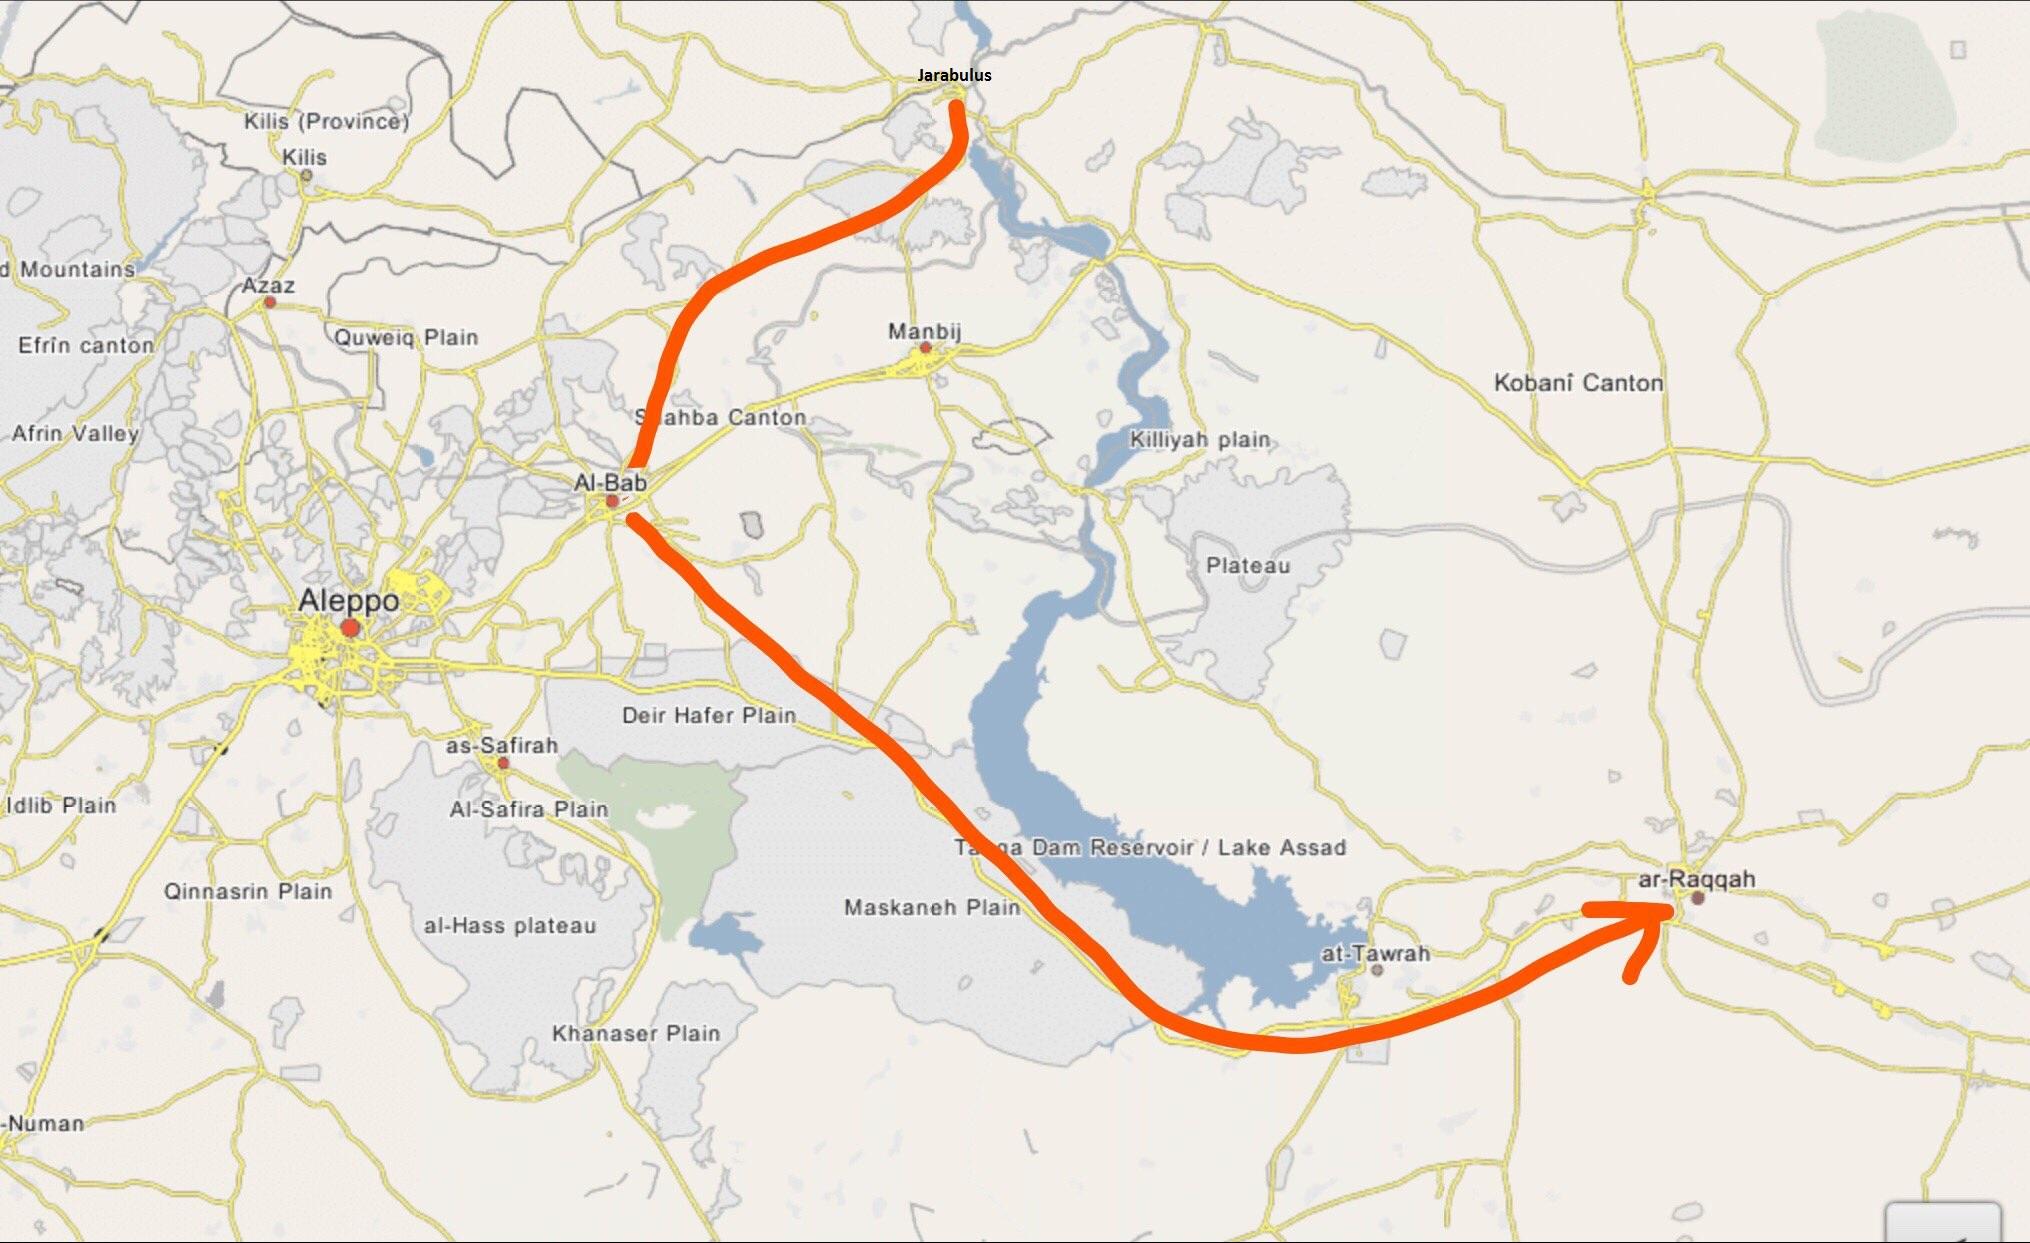 La route des aides djihadistes allant de Jarabulus à Al-Bab et de Al-Bab à Raqqa